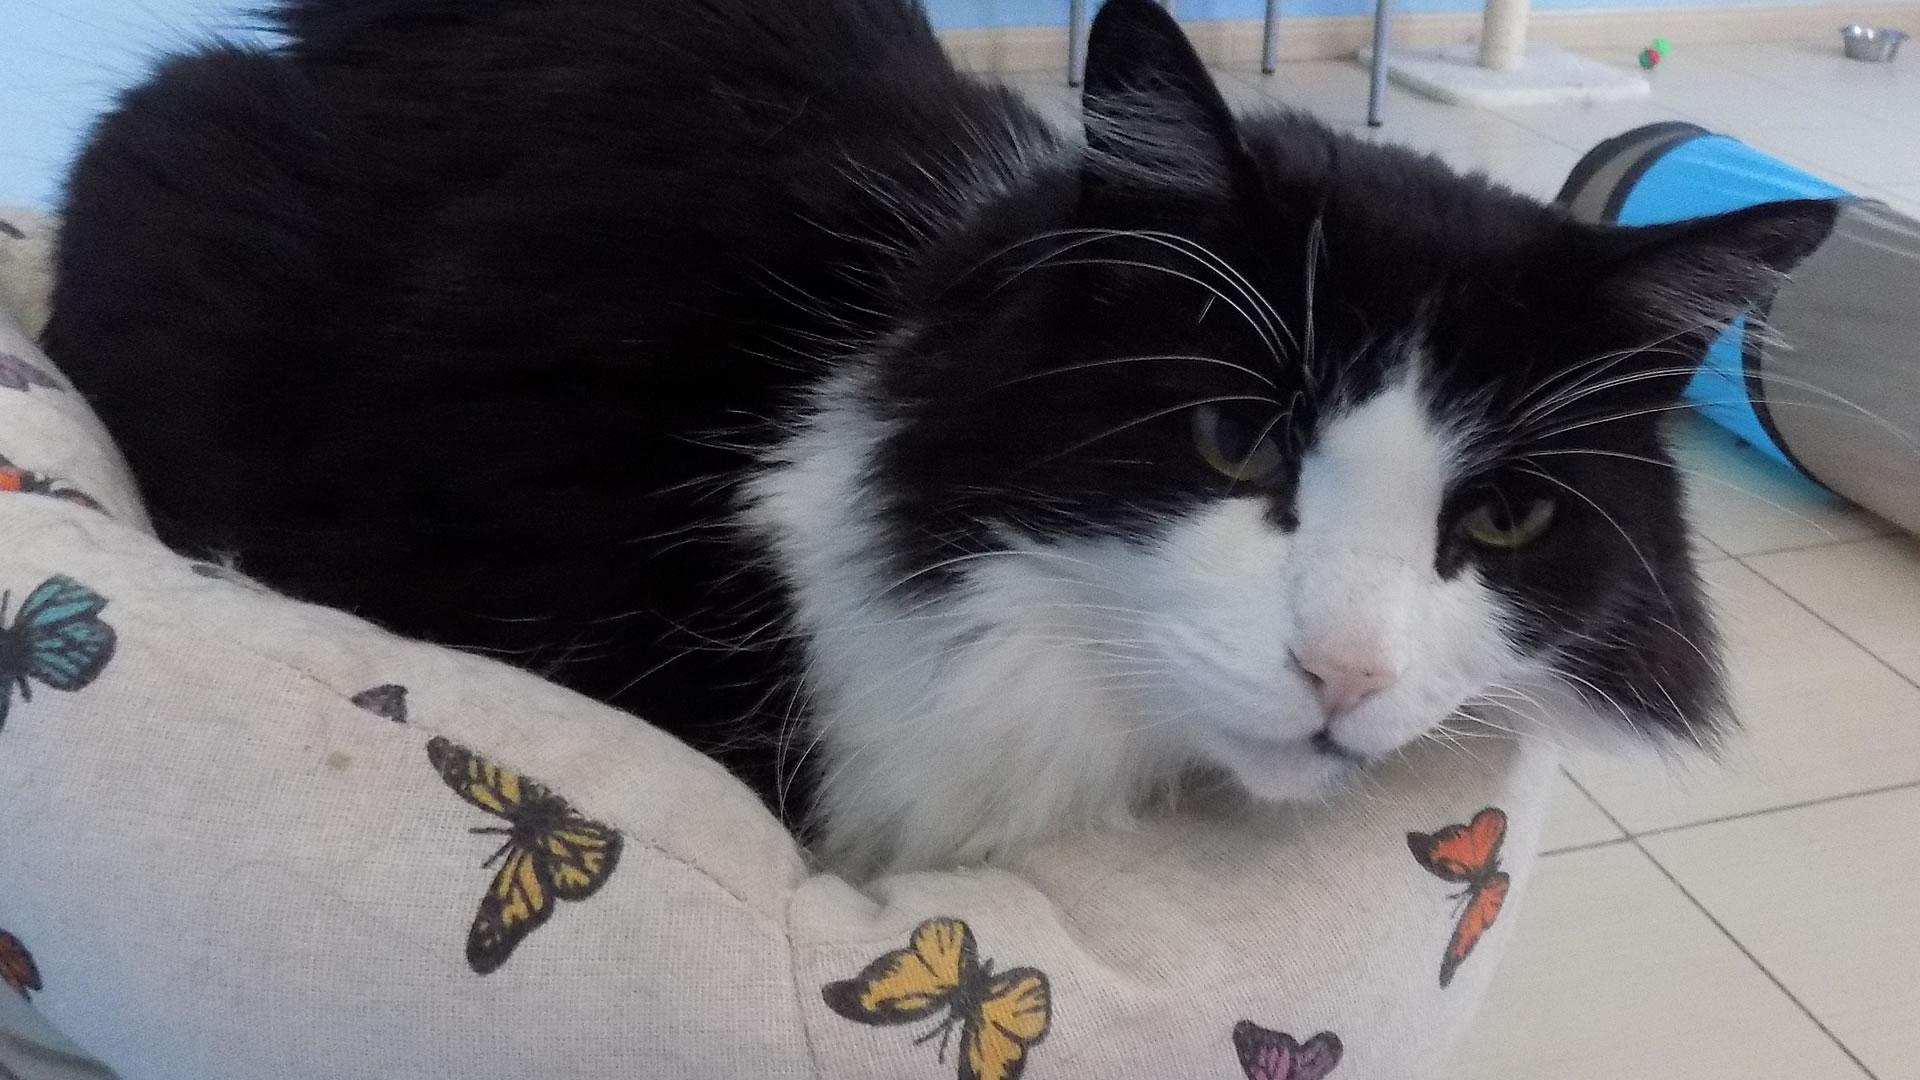 Change One Life Cat Sanctuary